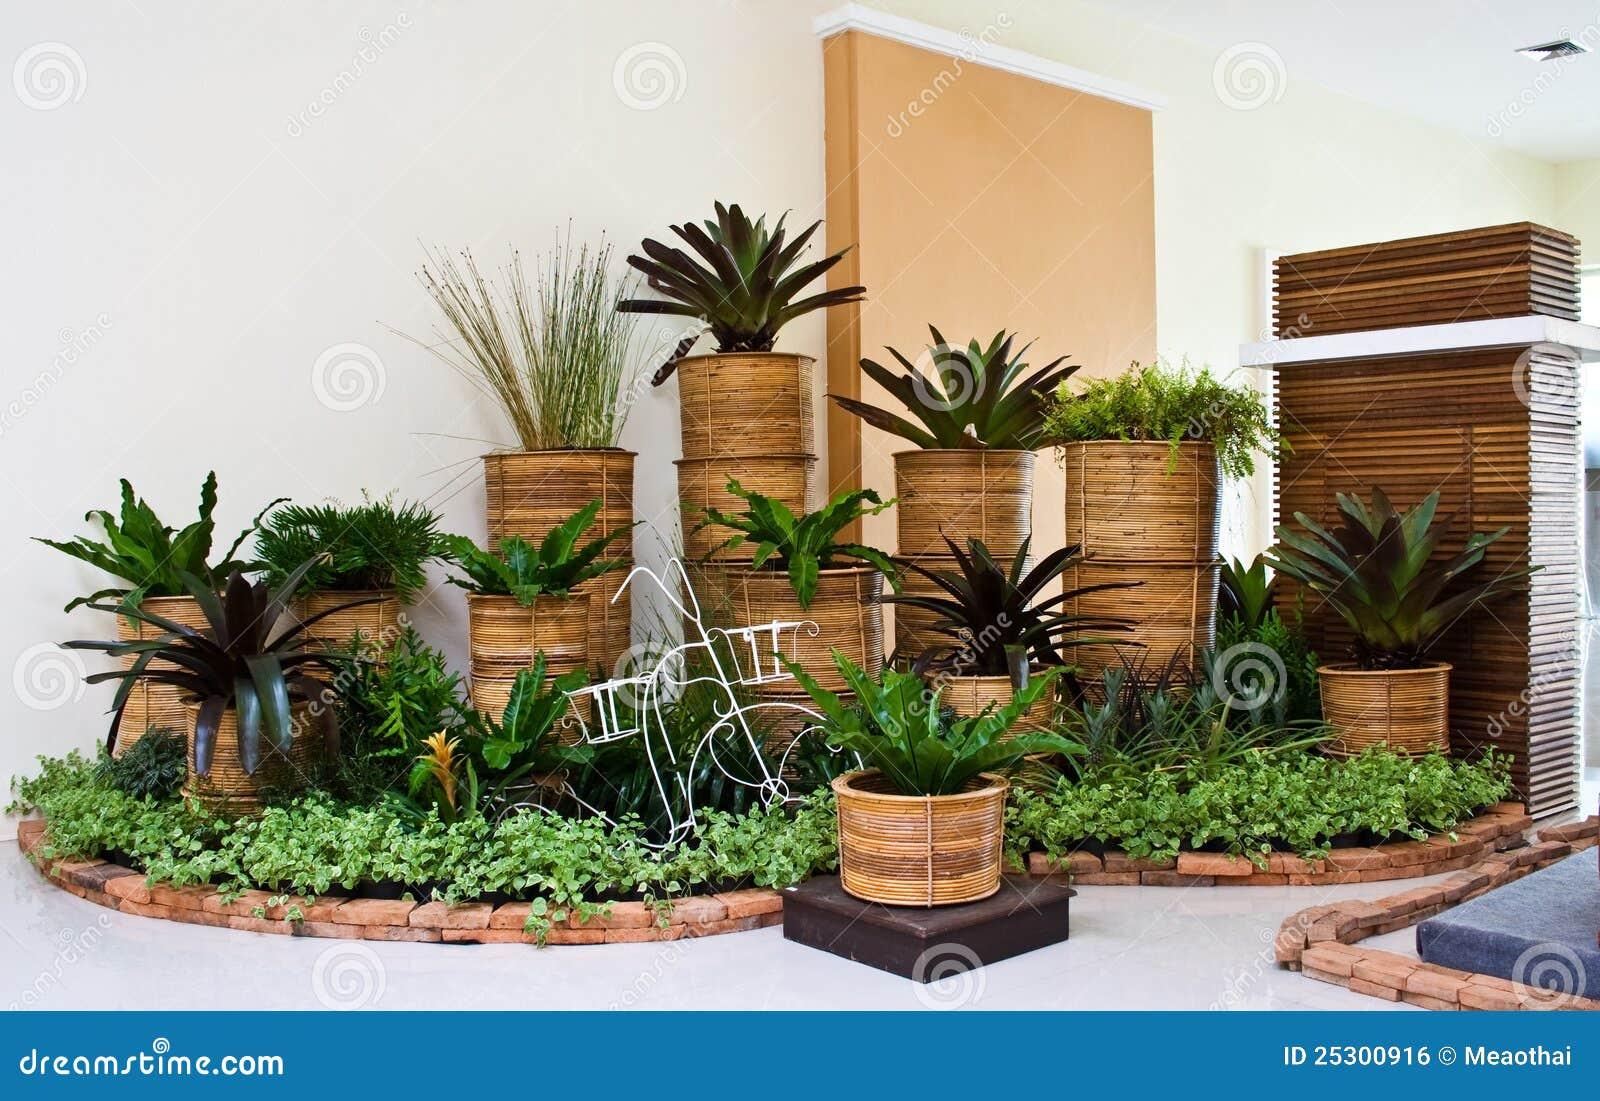 fotos de jardim interno : fotos de jardim interno:Indoor Garden Decoration